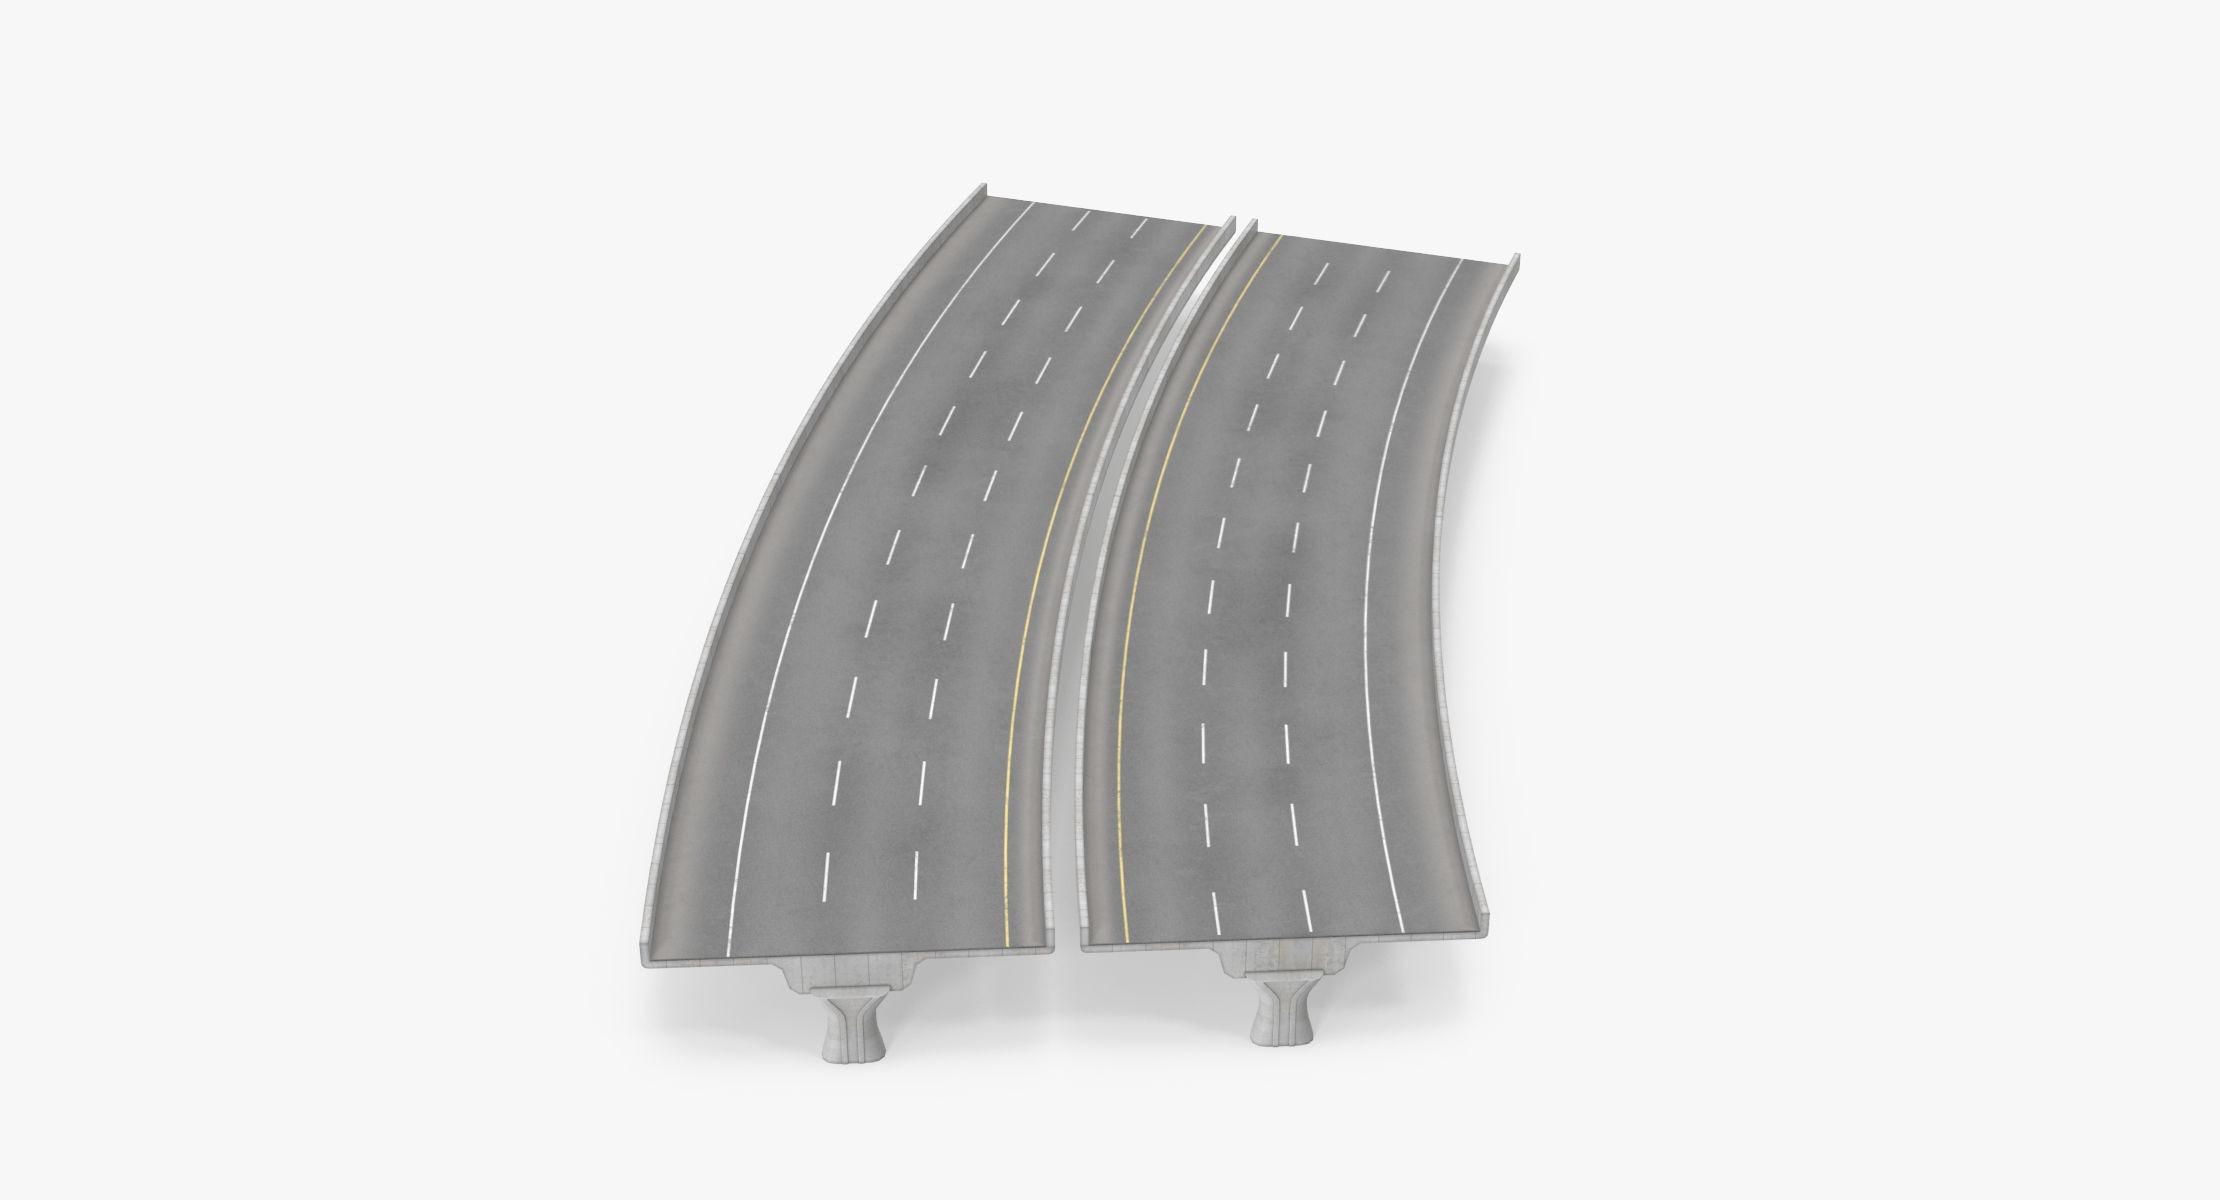 3 Lane Raised Highway 22.5 Degree Turn - 5m - reel 1